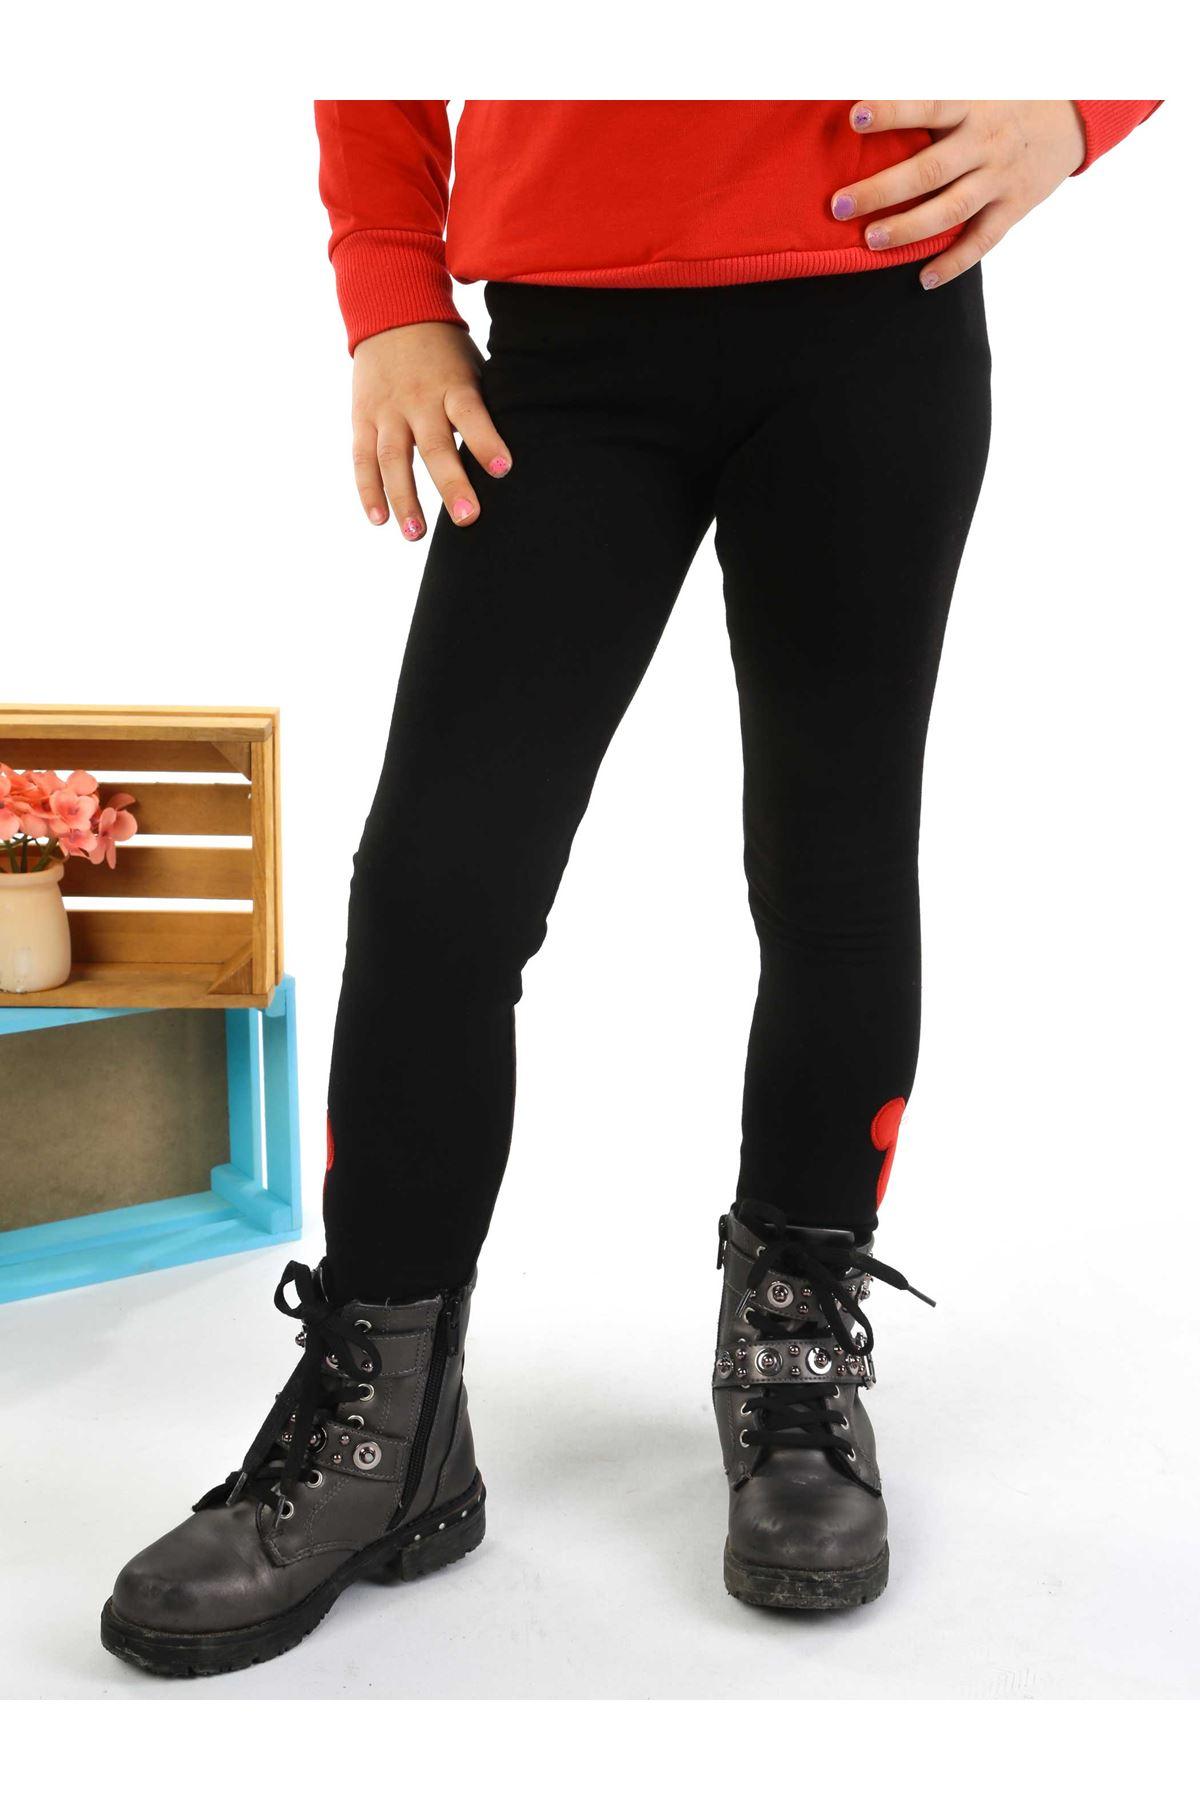 Kırmızı Siyah 2 li Kız Çocuk Taytlı Takım